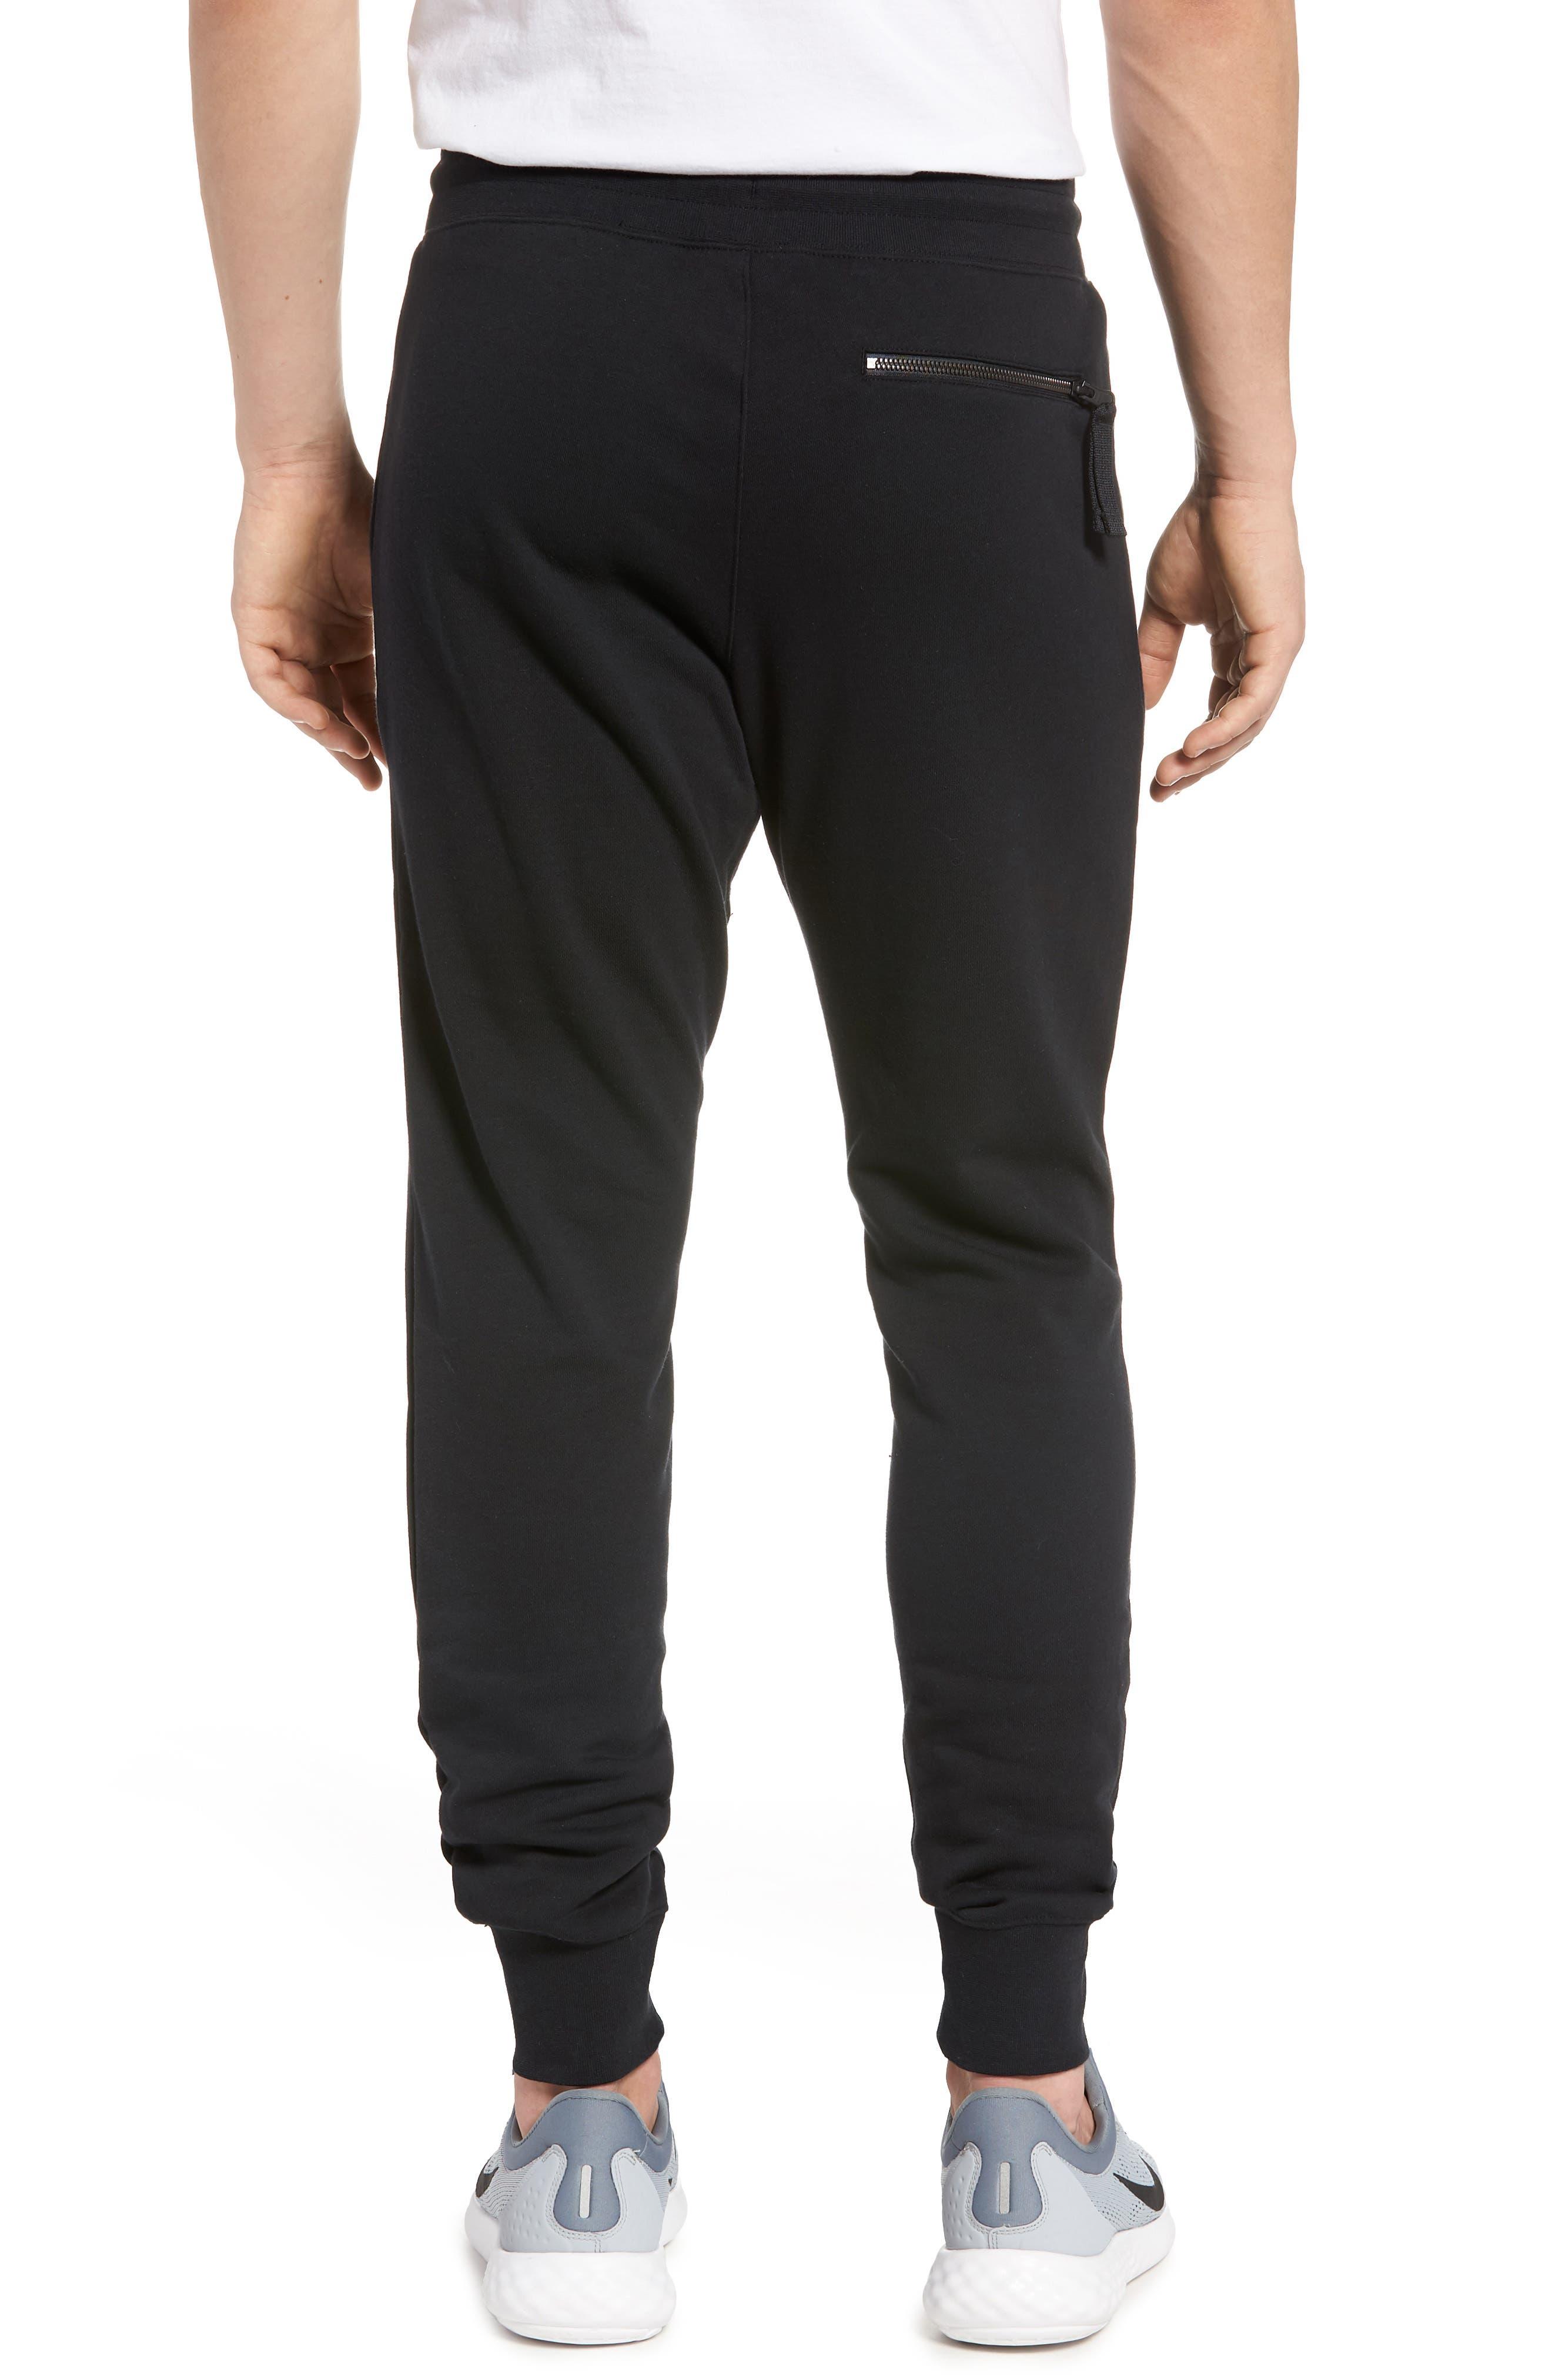 Sportswear Air Force 1 Jogger Pants,                             Alternate thumbnail 2, color,                             BLACK/ ANTHRACITE